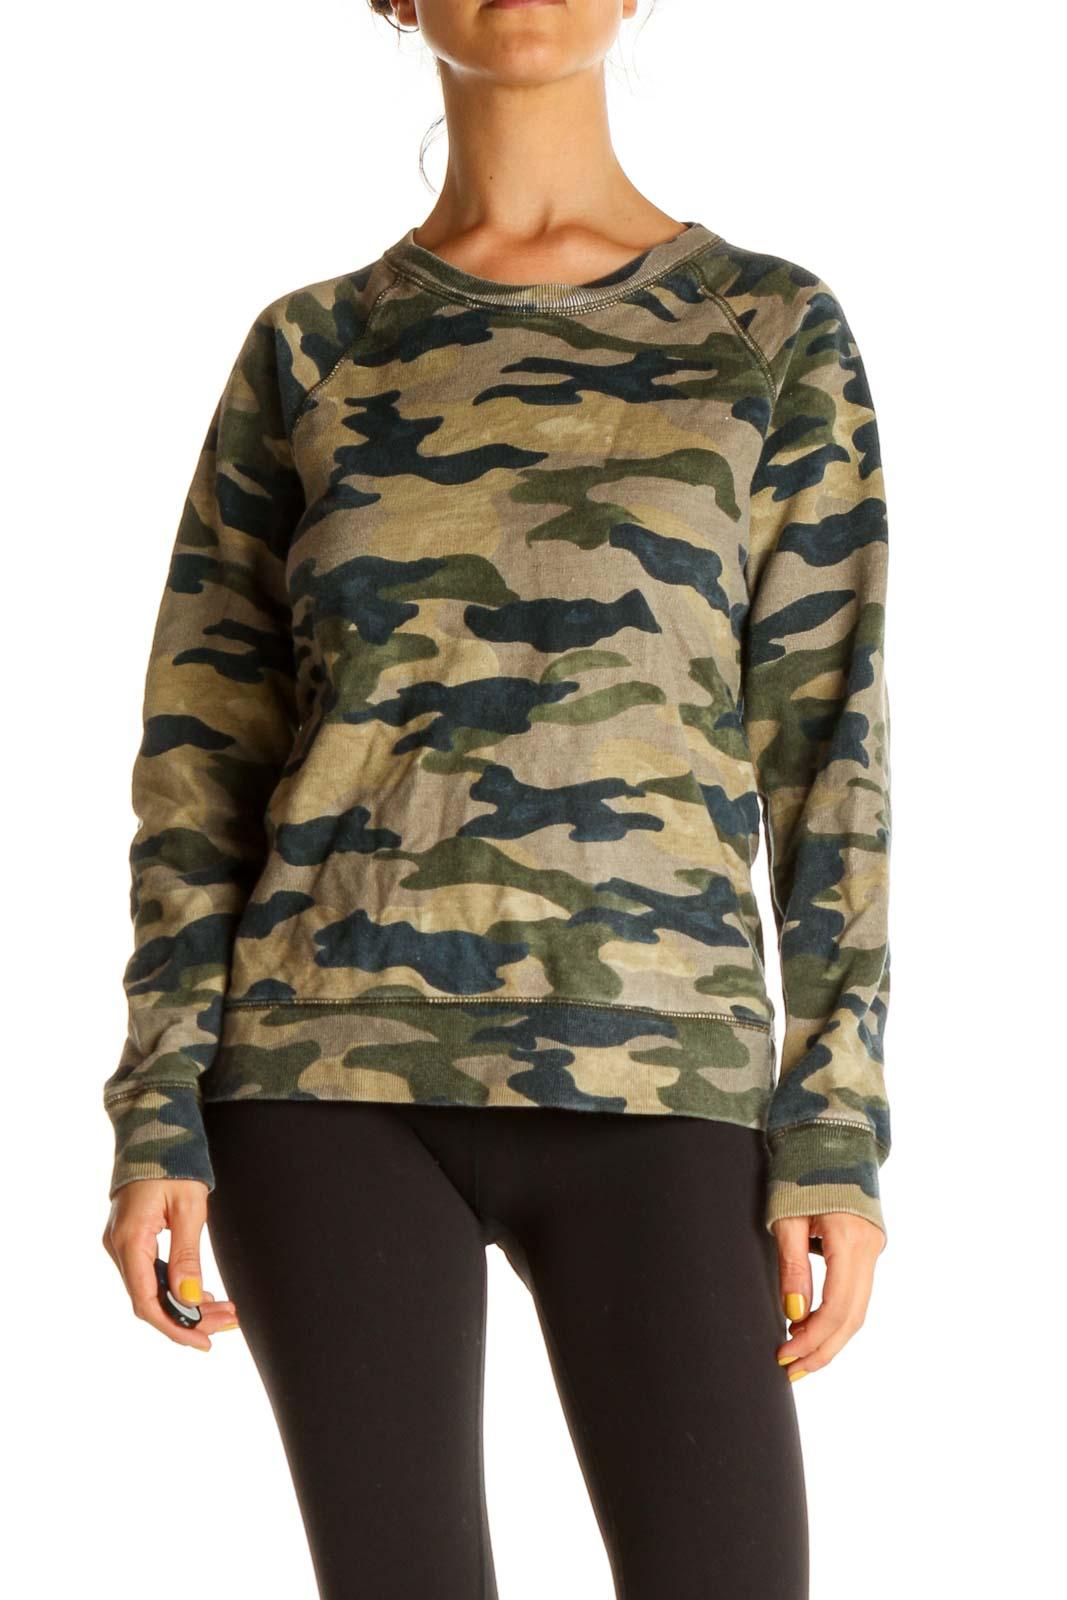 Green Camouflage Print Sweatshirt Front